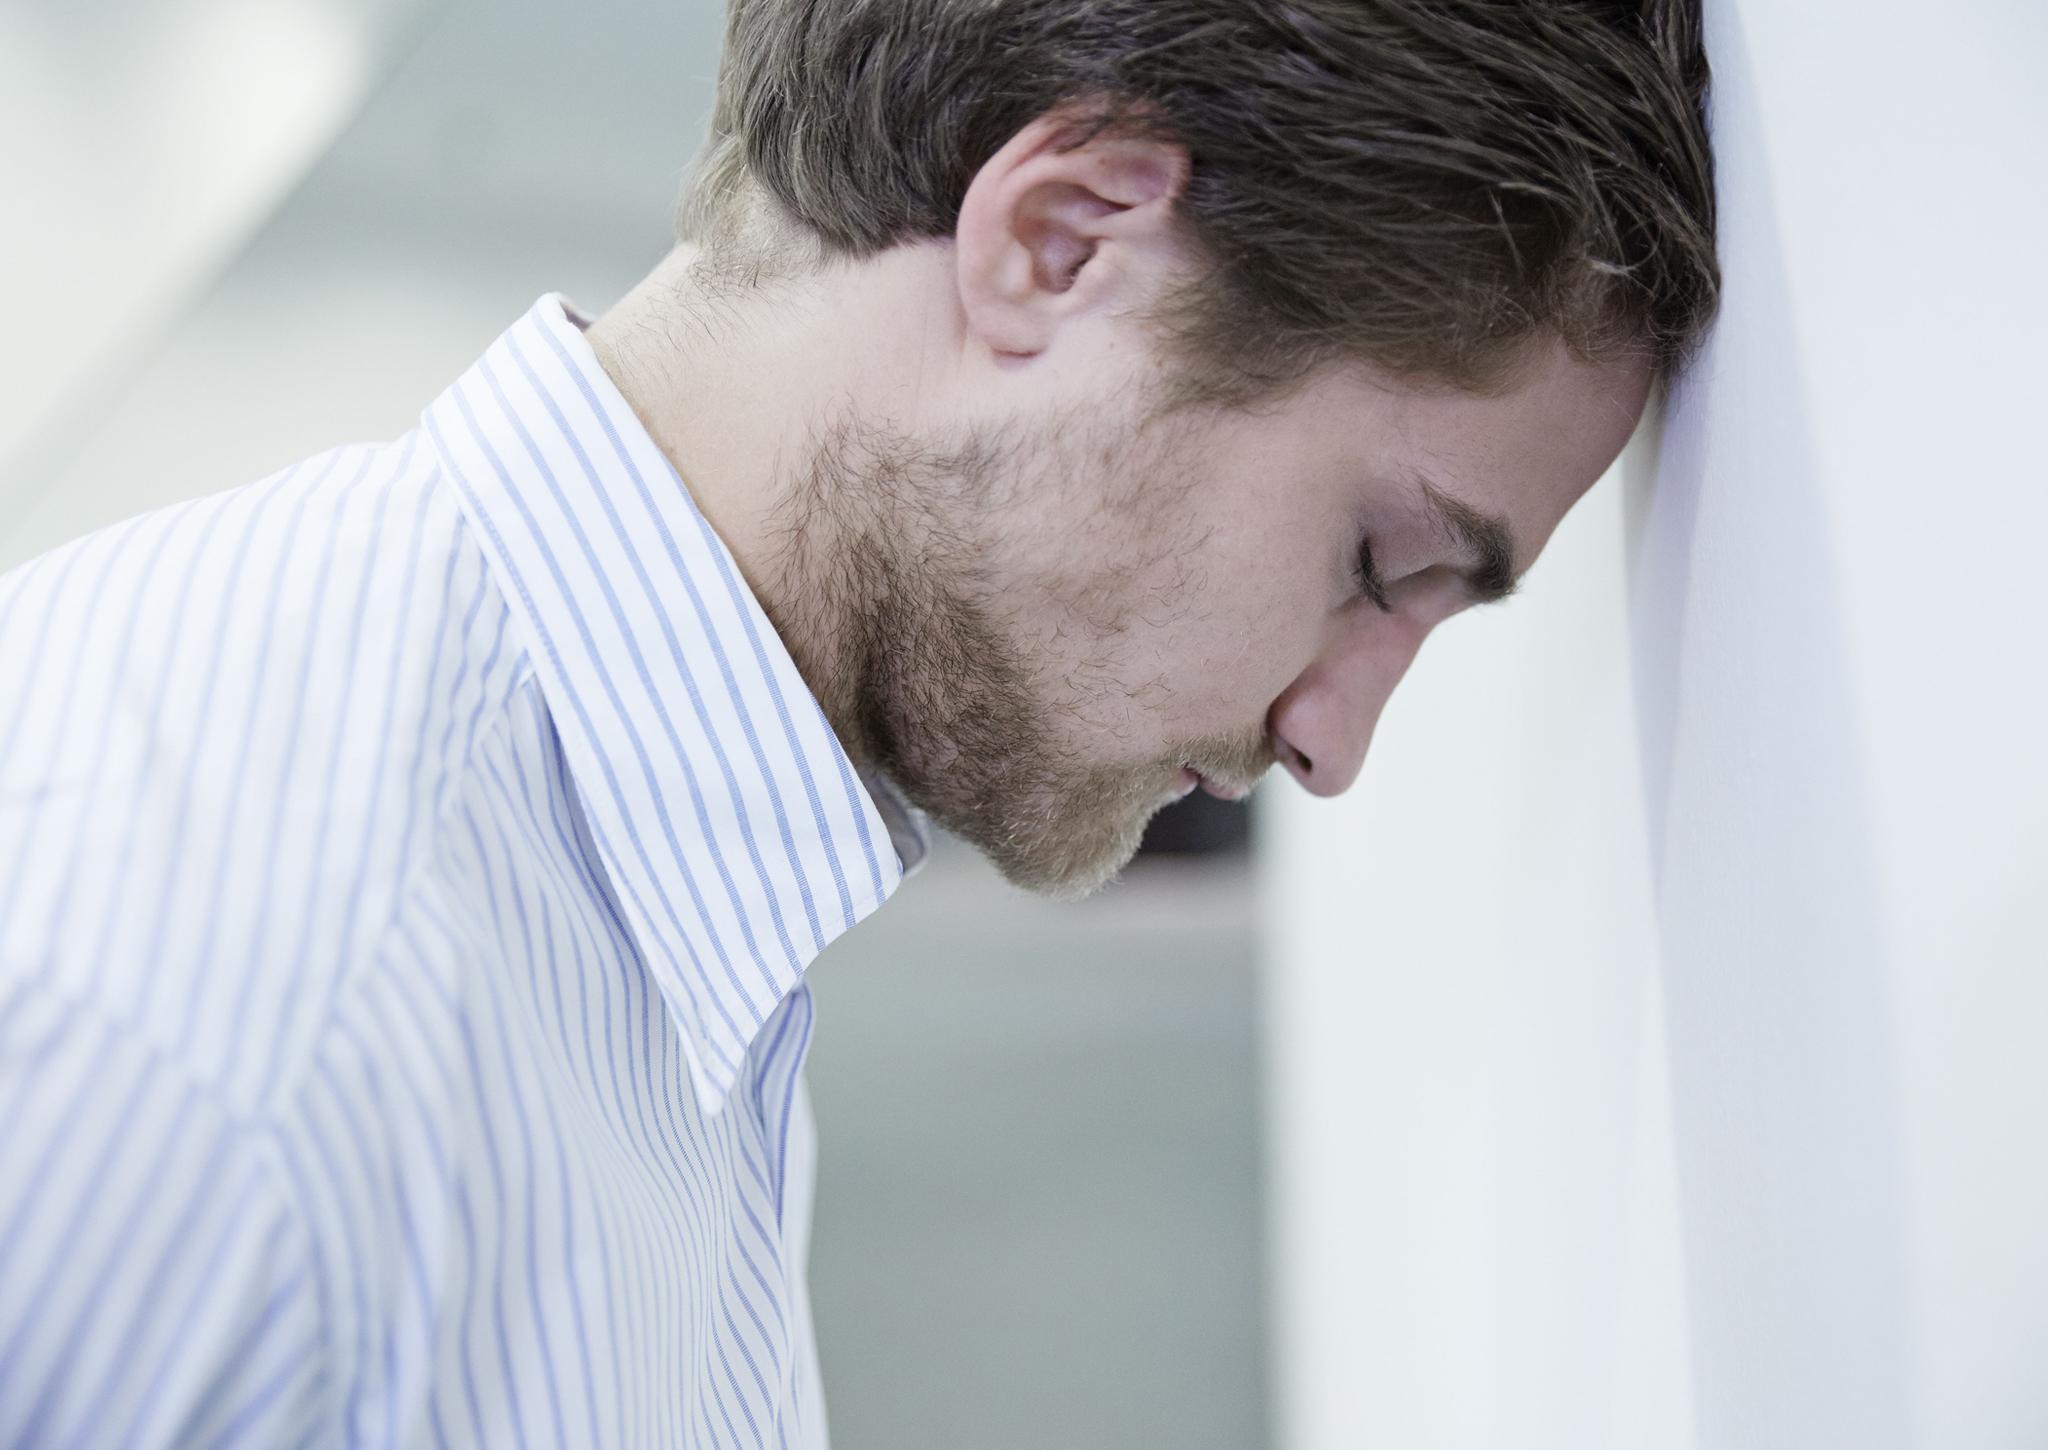 Dating sites cause depression